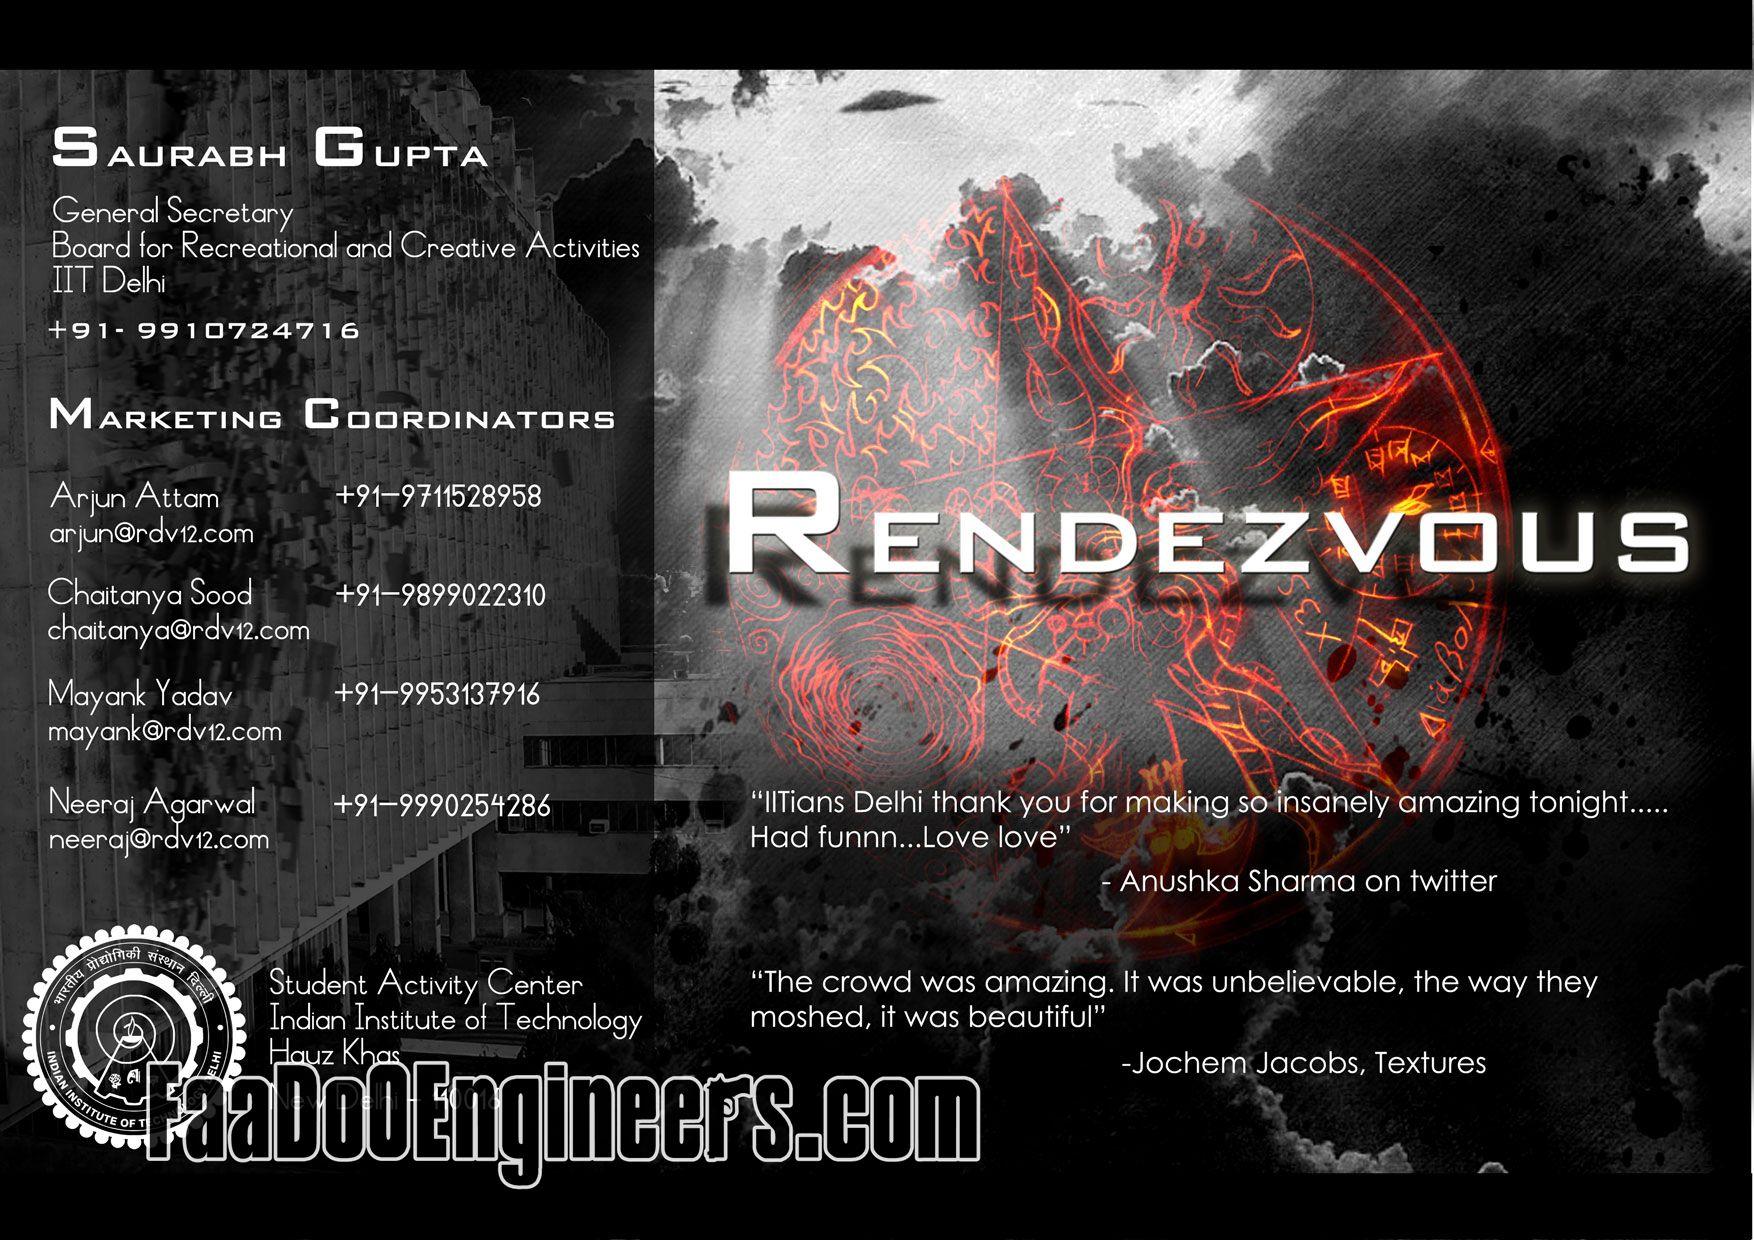 rendezvous-2012-iit-delhi-cult-fest-004